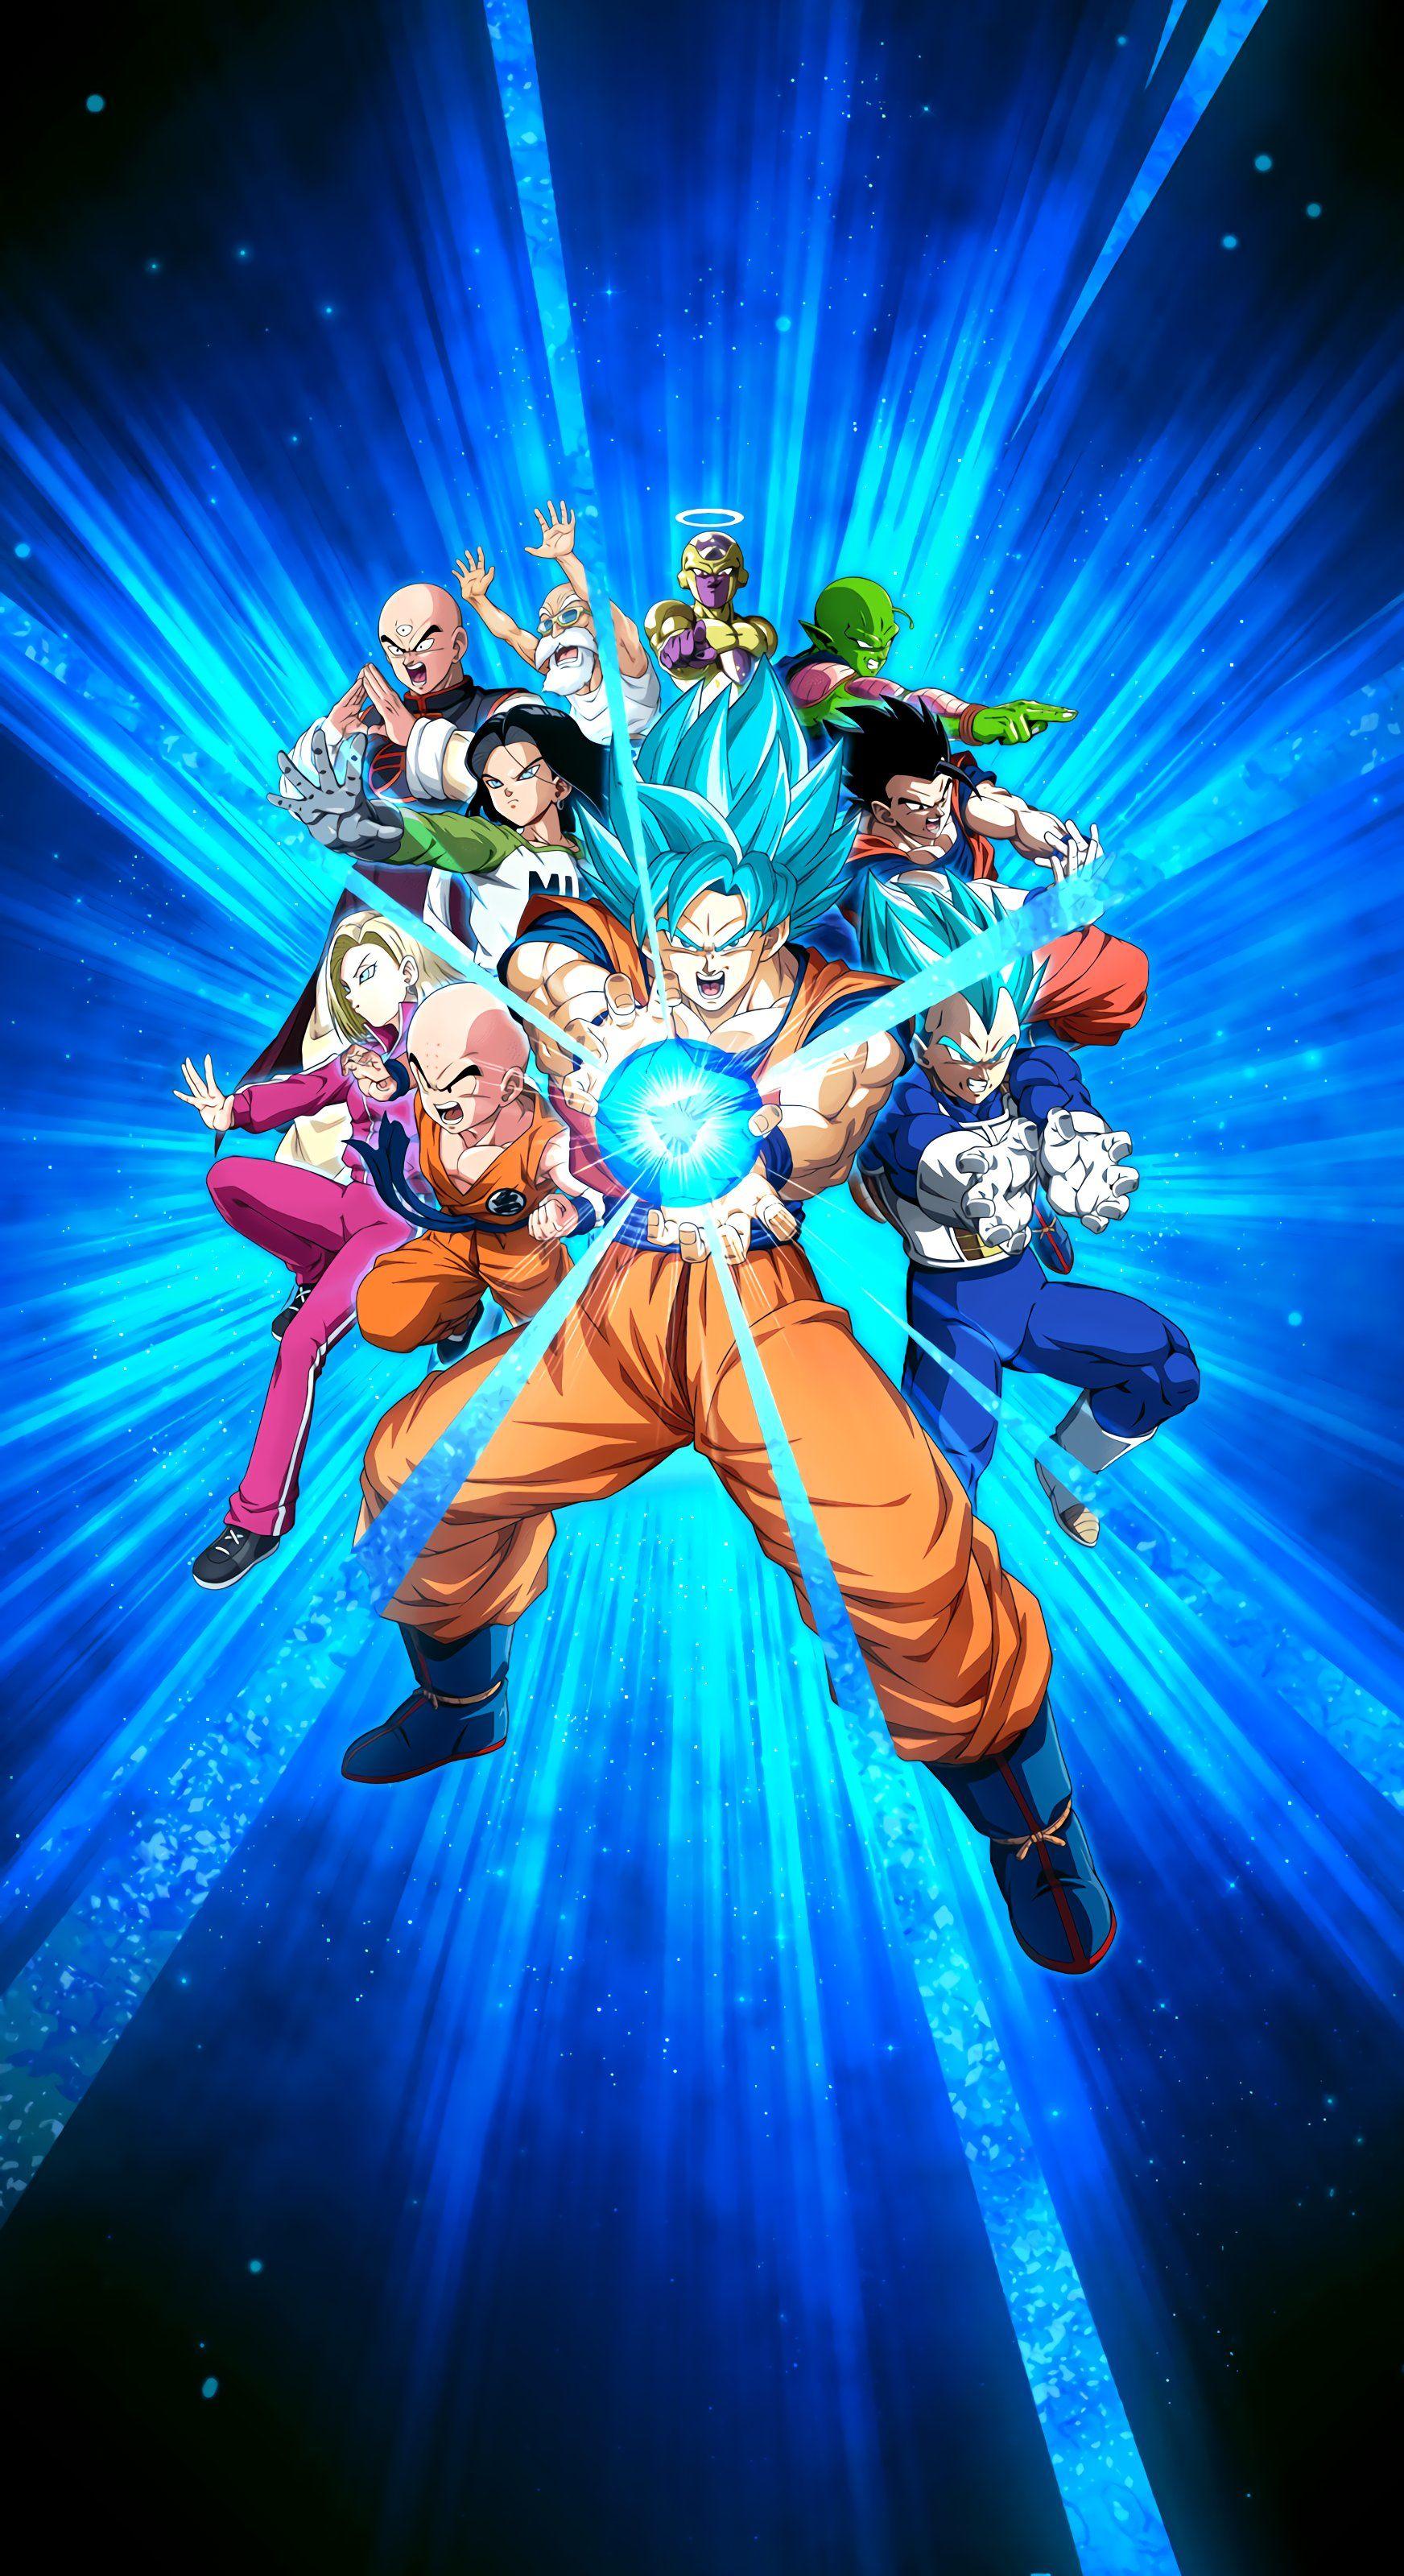 Dokkan Battle 6th Anniversary Wallpaper In 2021 Anime Dragon Ball Super Dragon Ball Image Dragon Ball Art